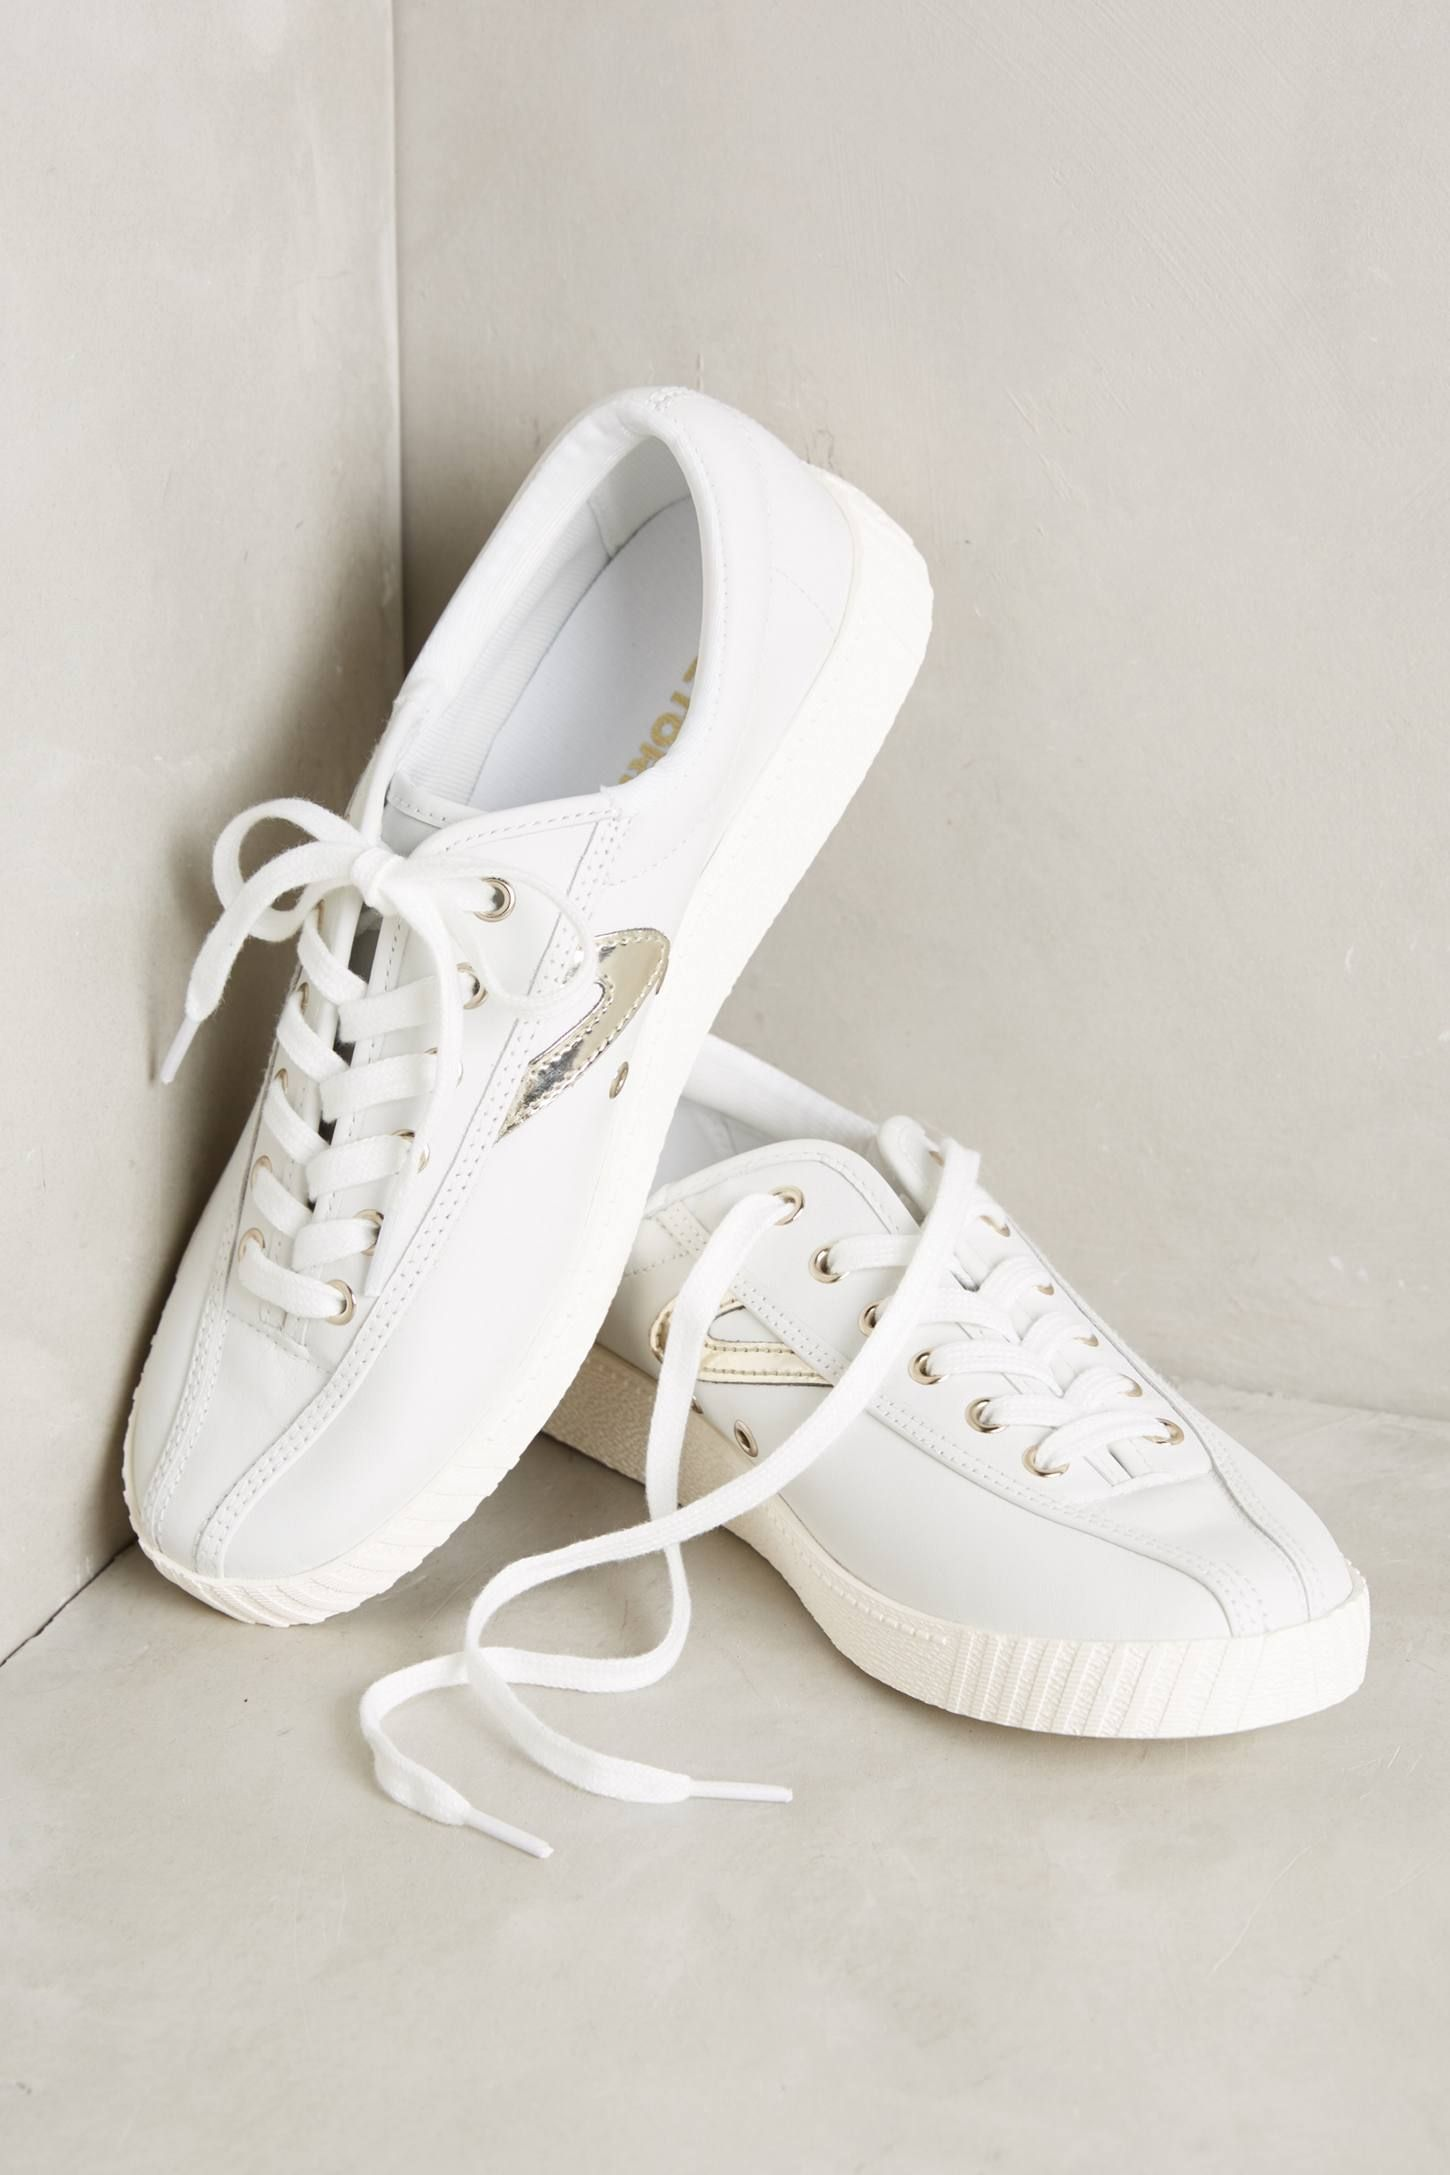 Tretorn Leather Sneakers | Tretorn